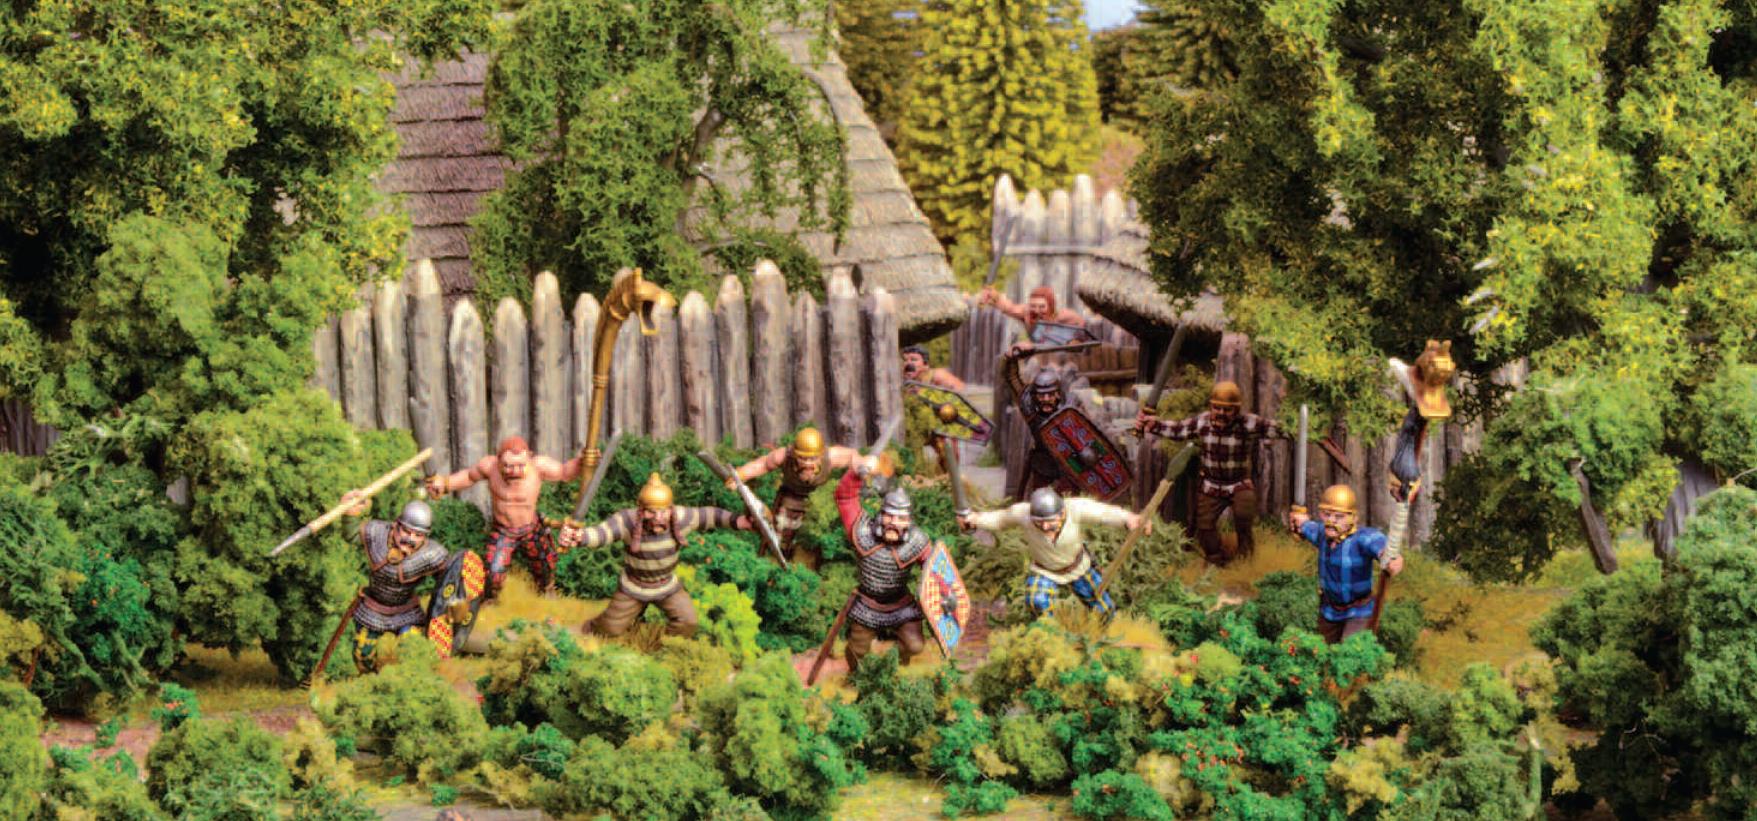 Gaul Warriors descend